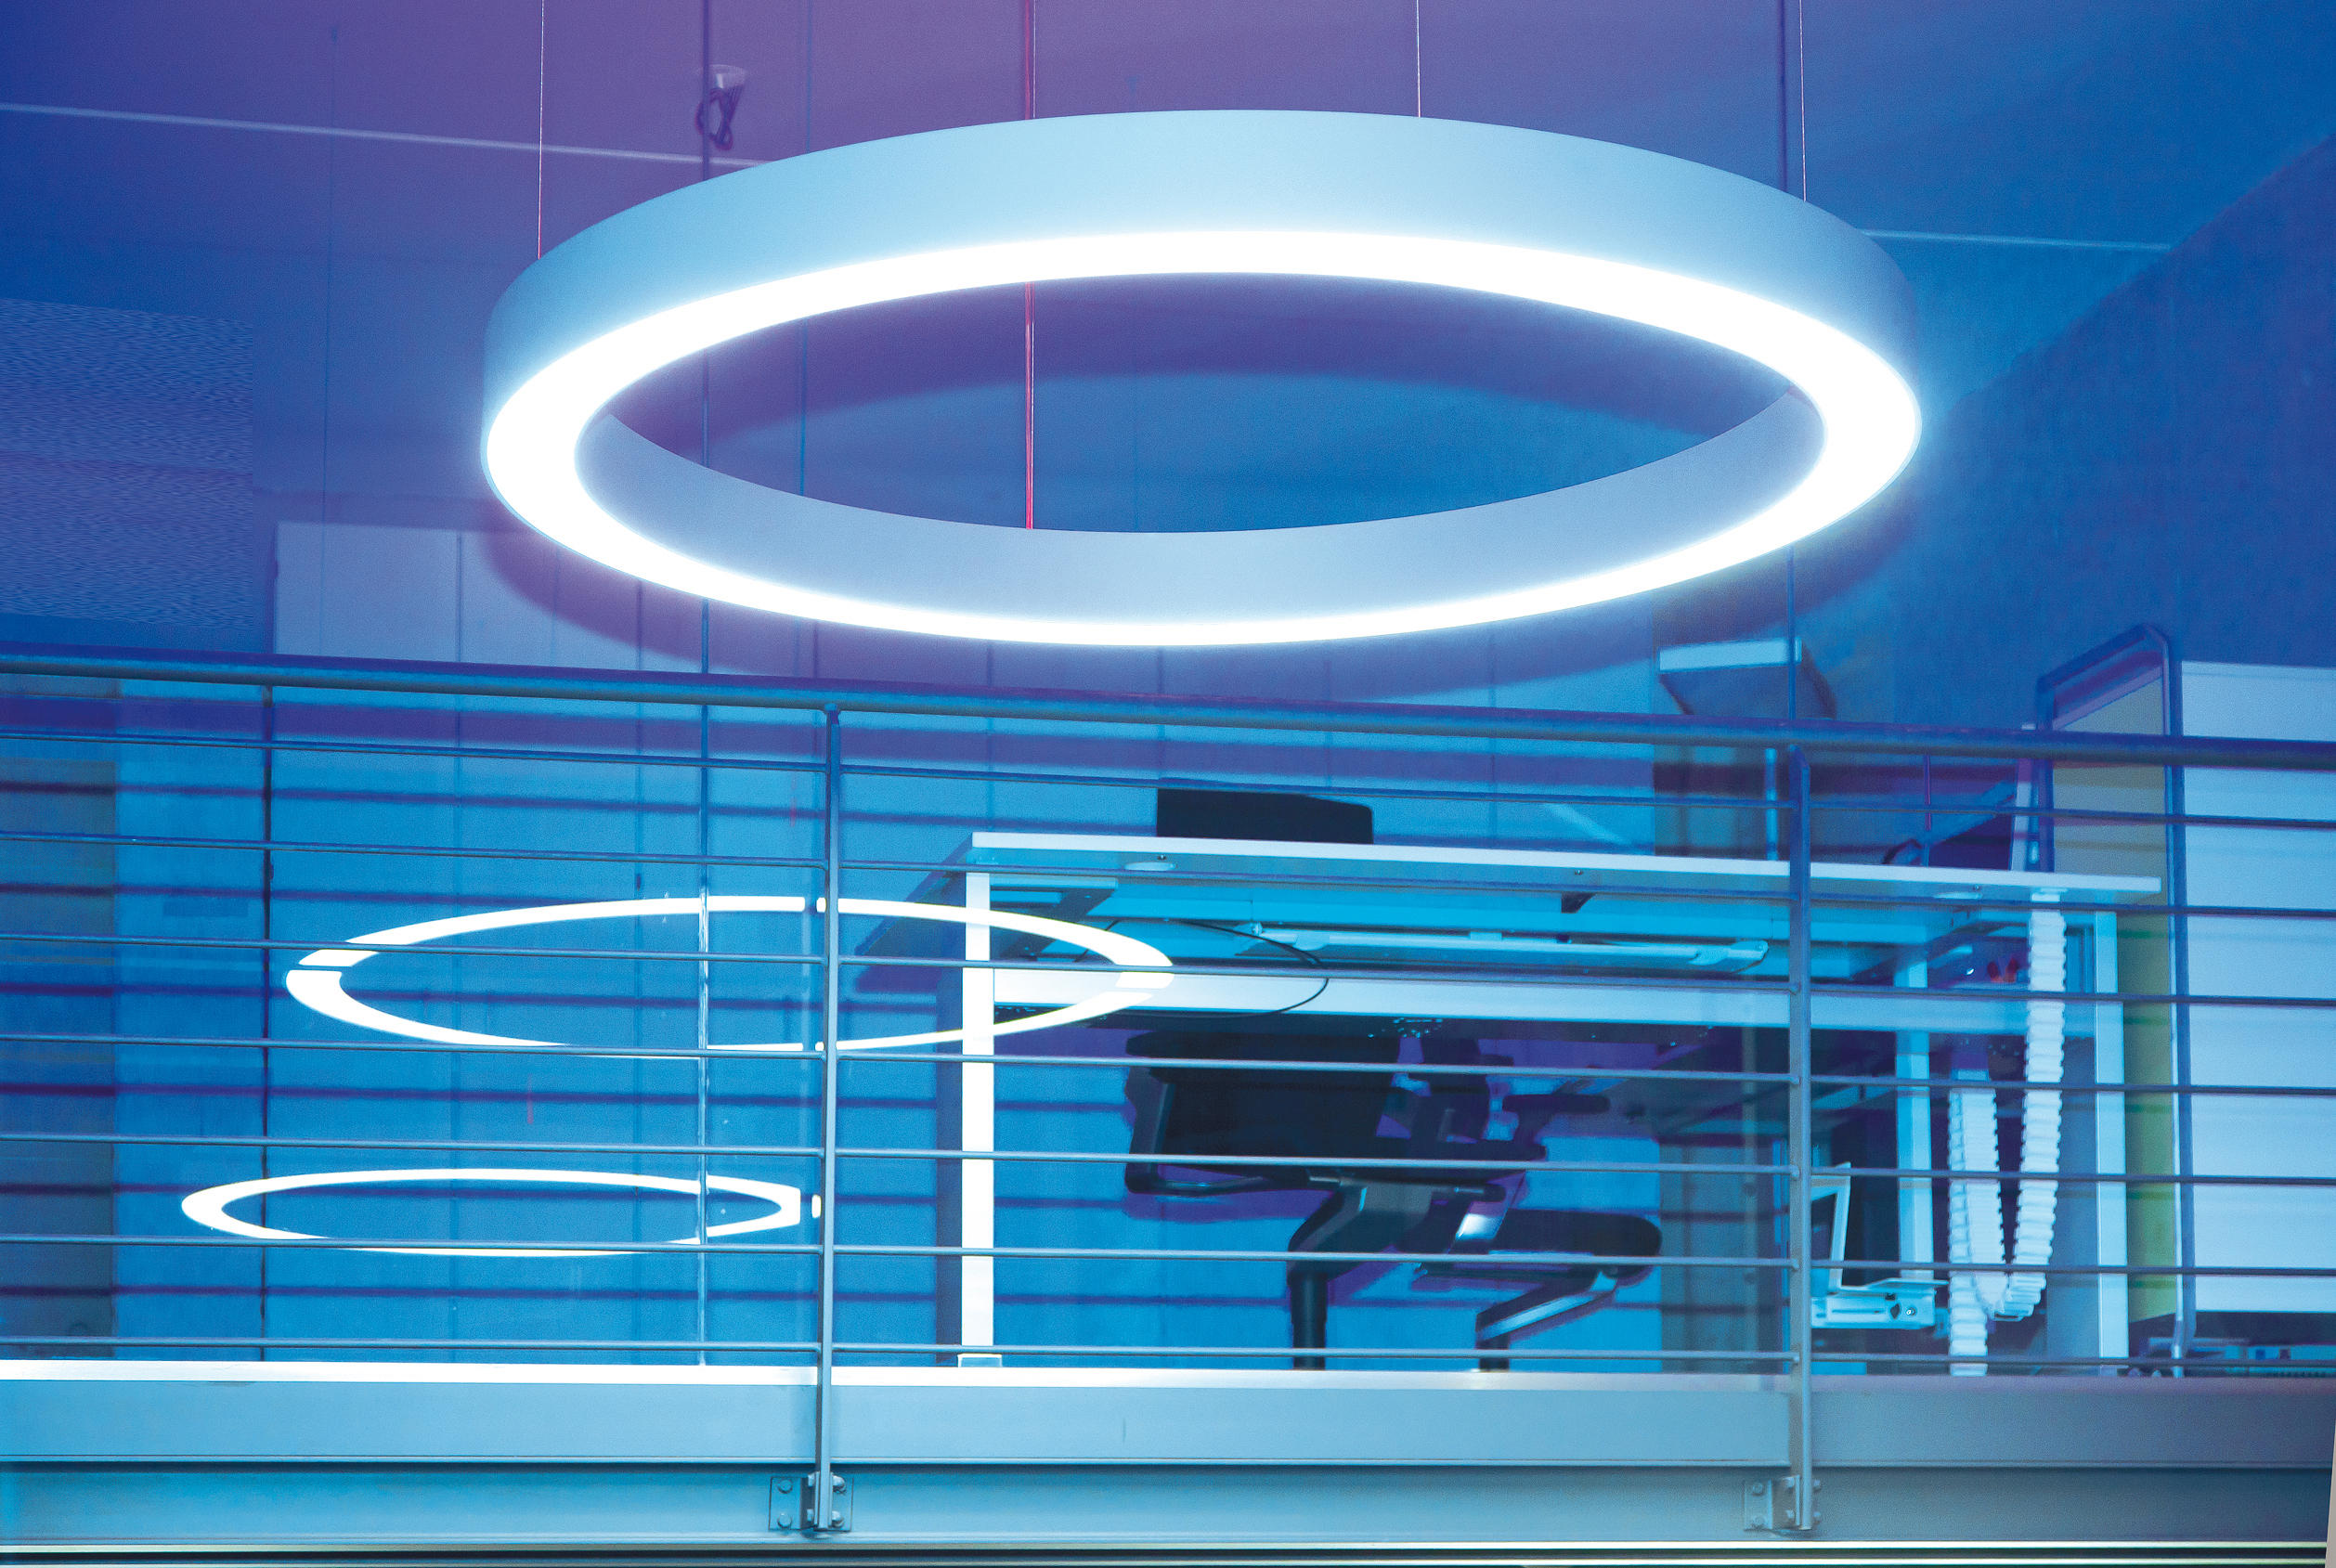 ringo star p1 g1 general lighting from lightnet architonic. Black Bedroom Furniture Sets. Home Design Ideas